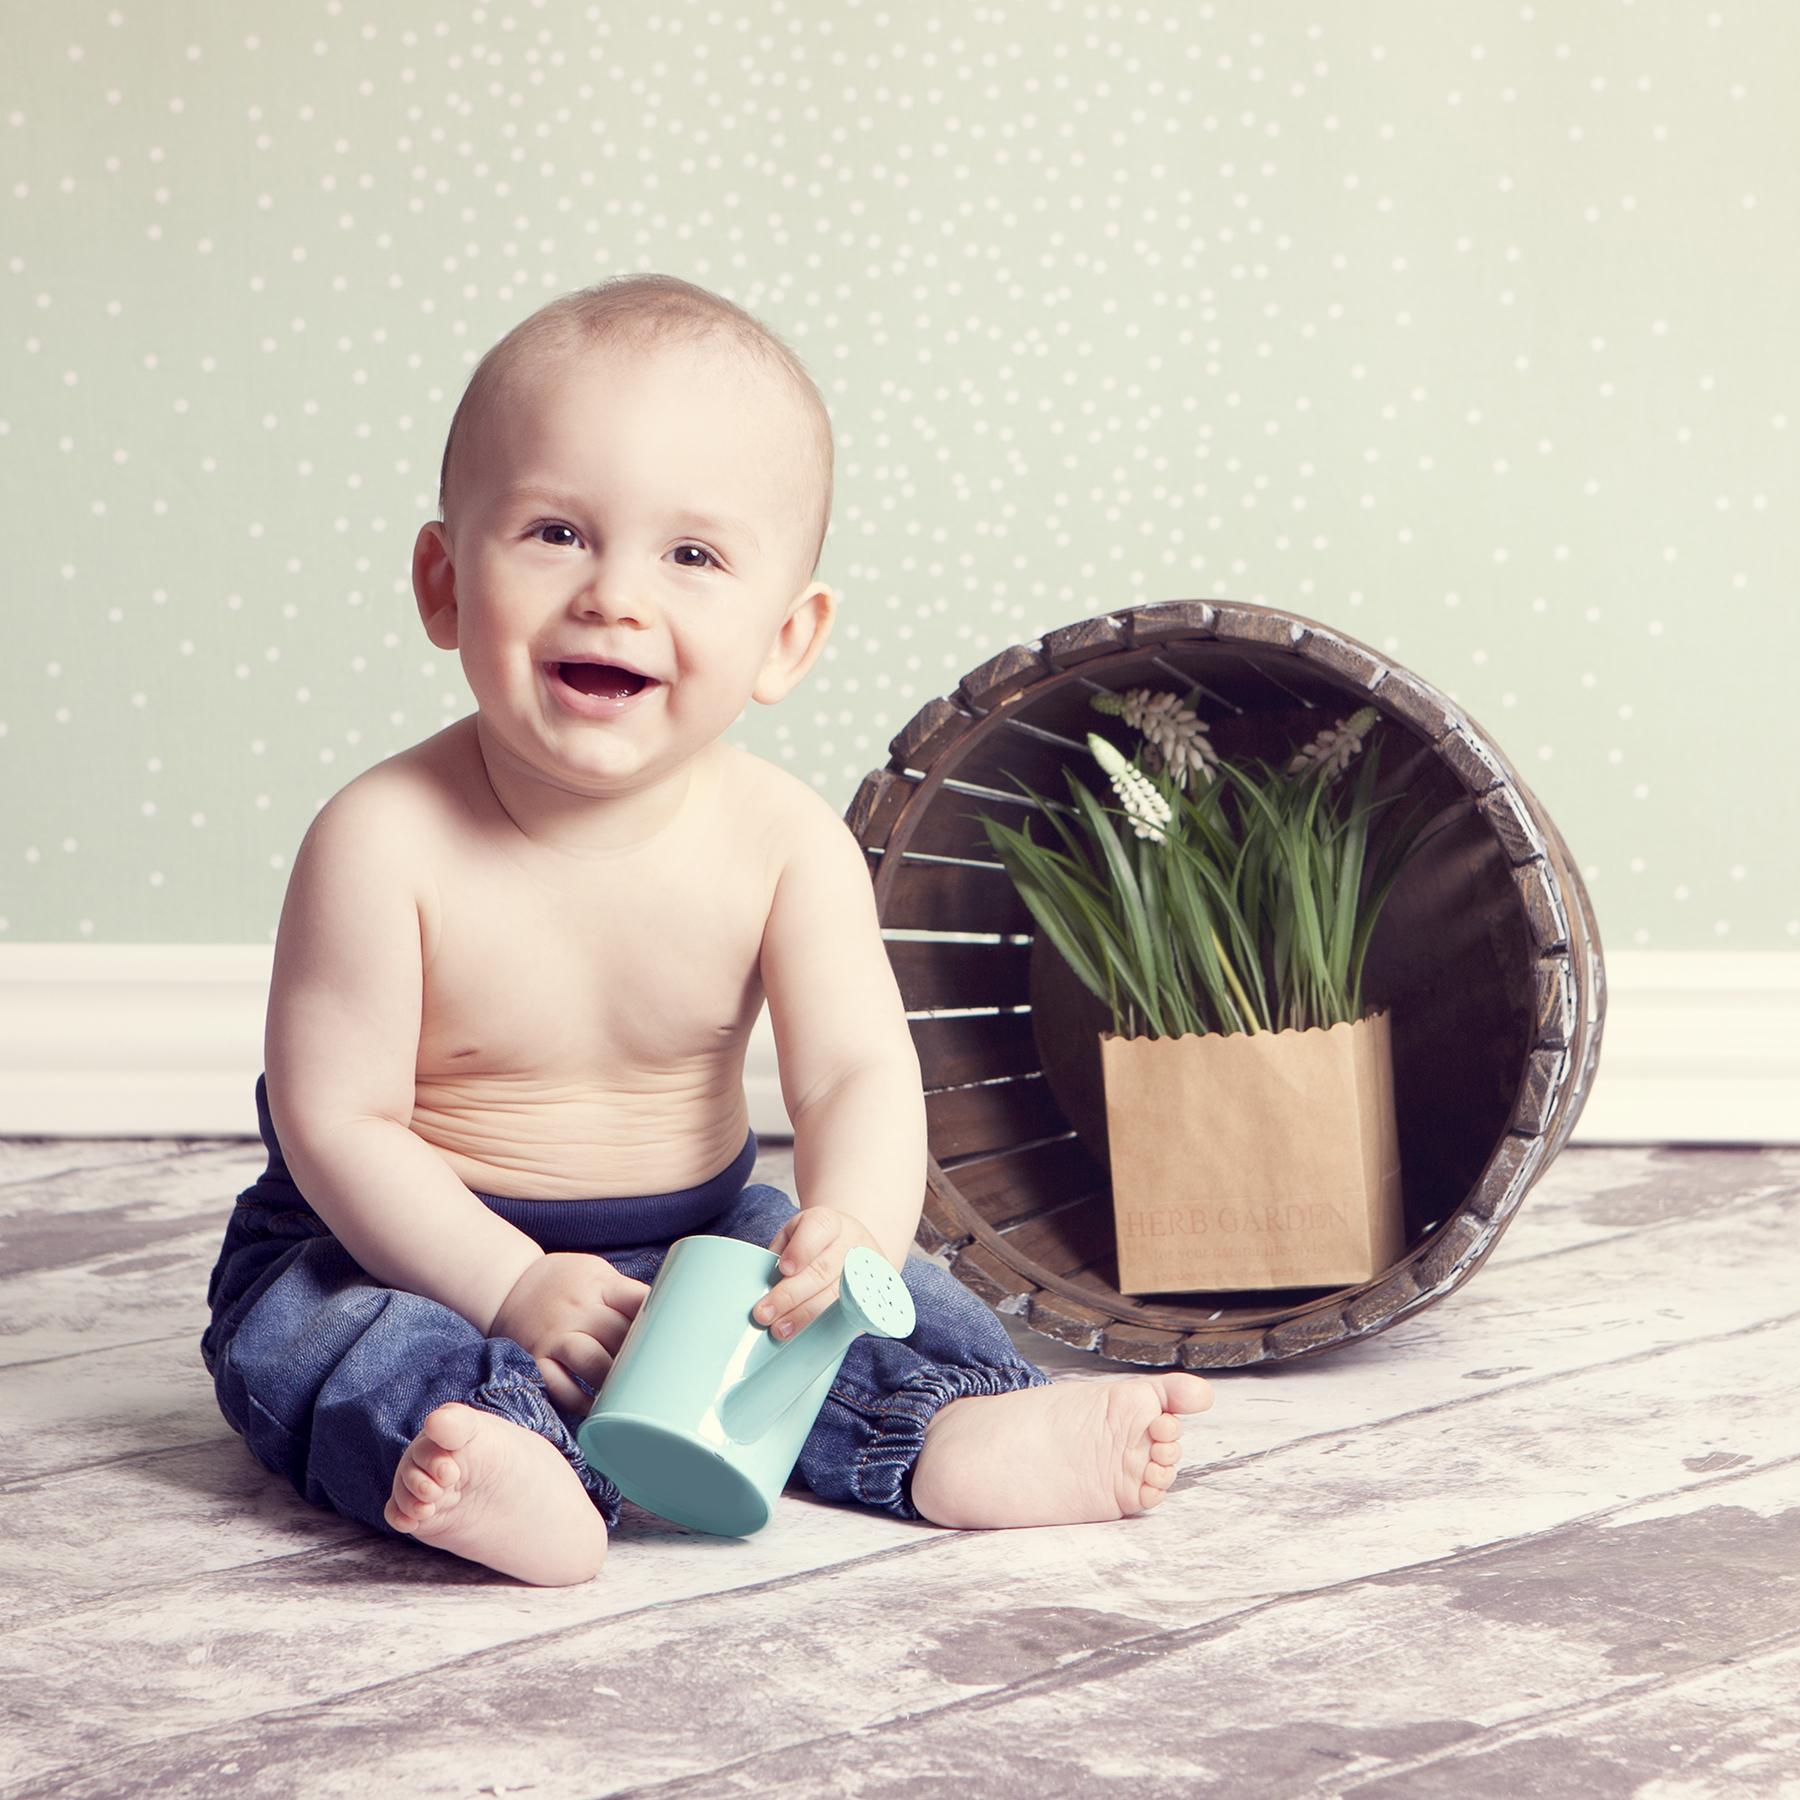 Fotograf Ann - Baby fotografering